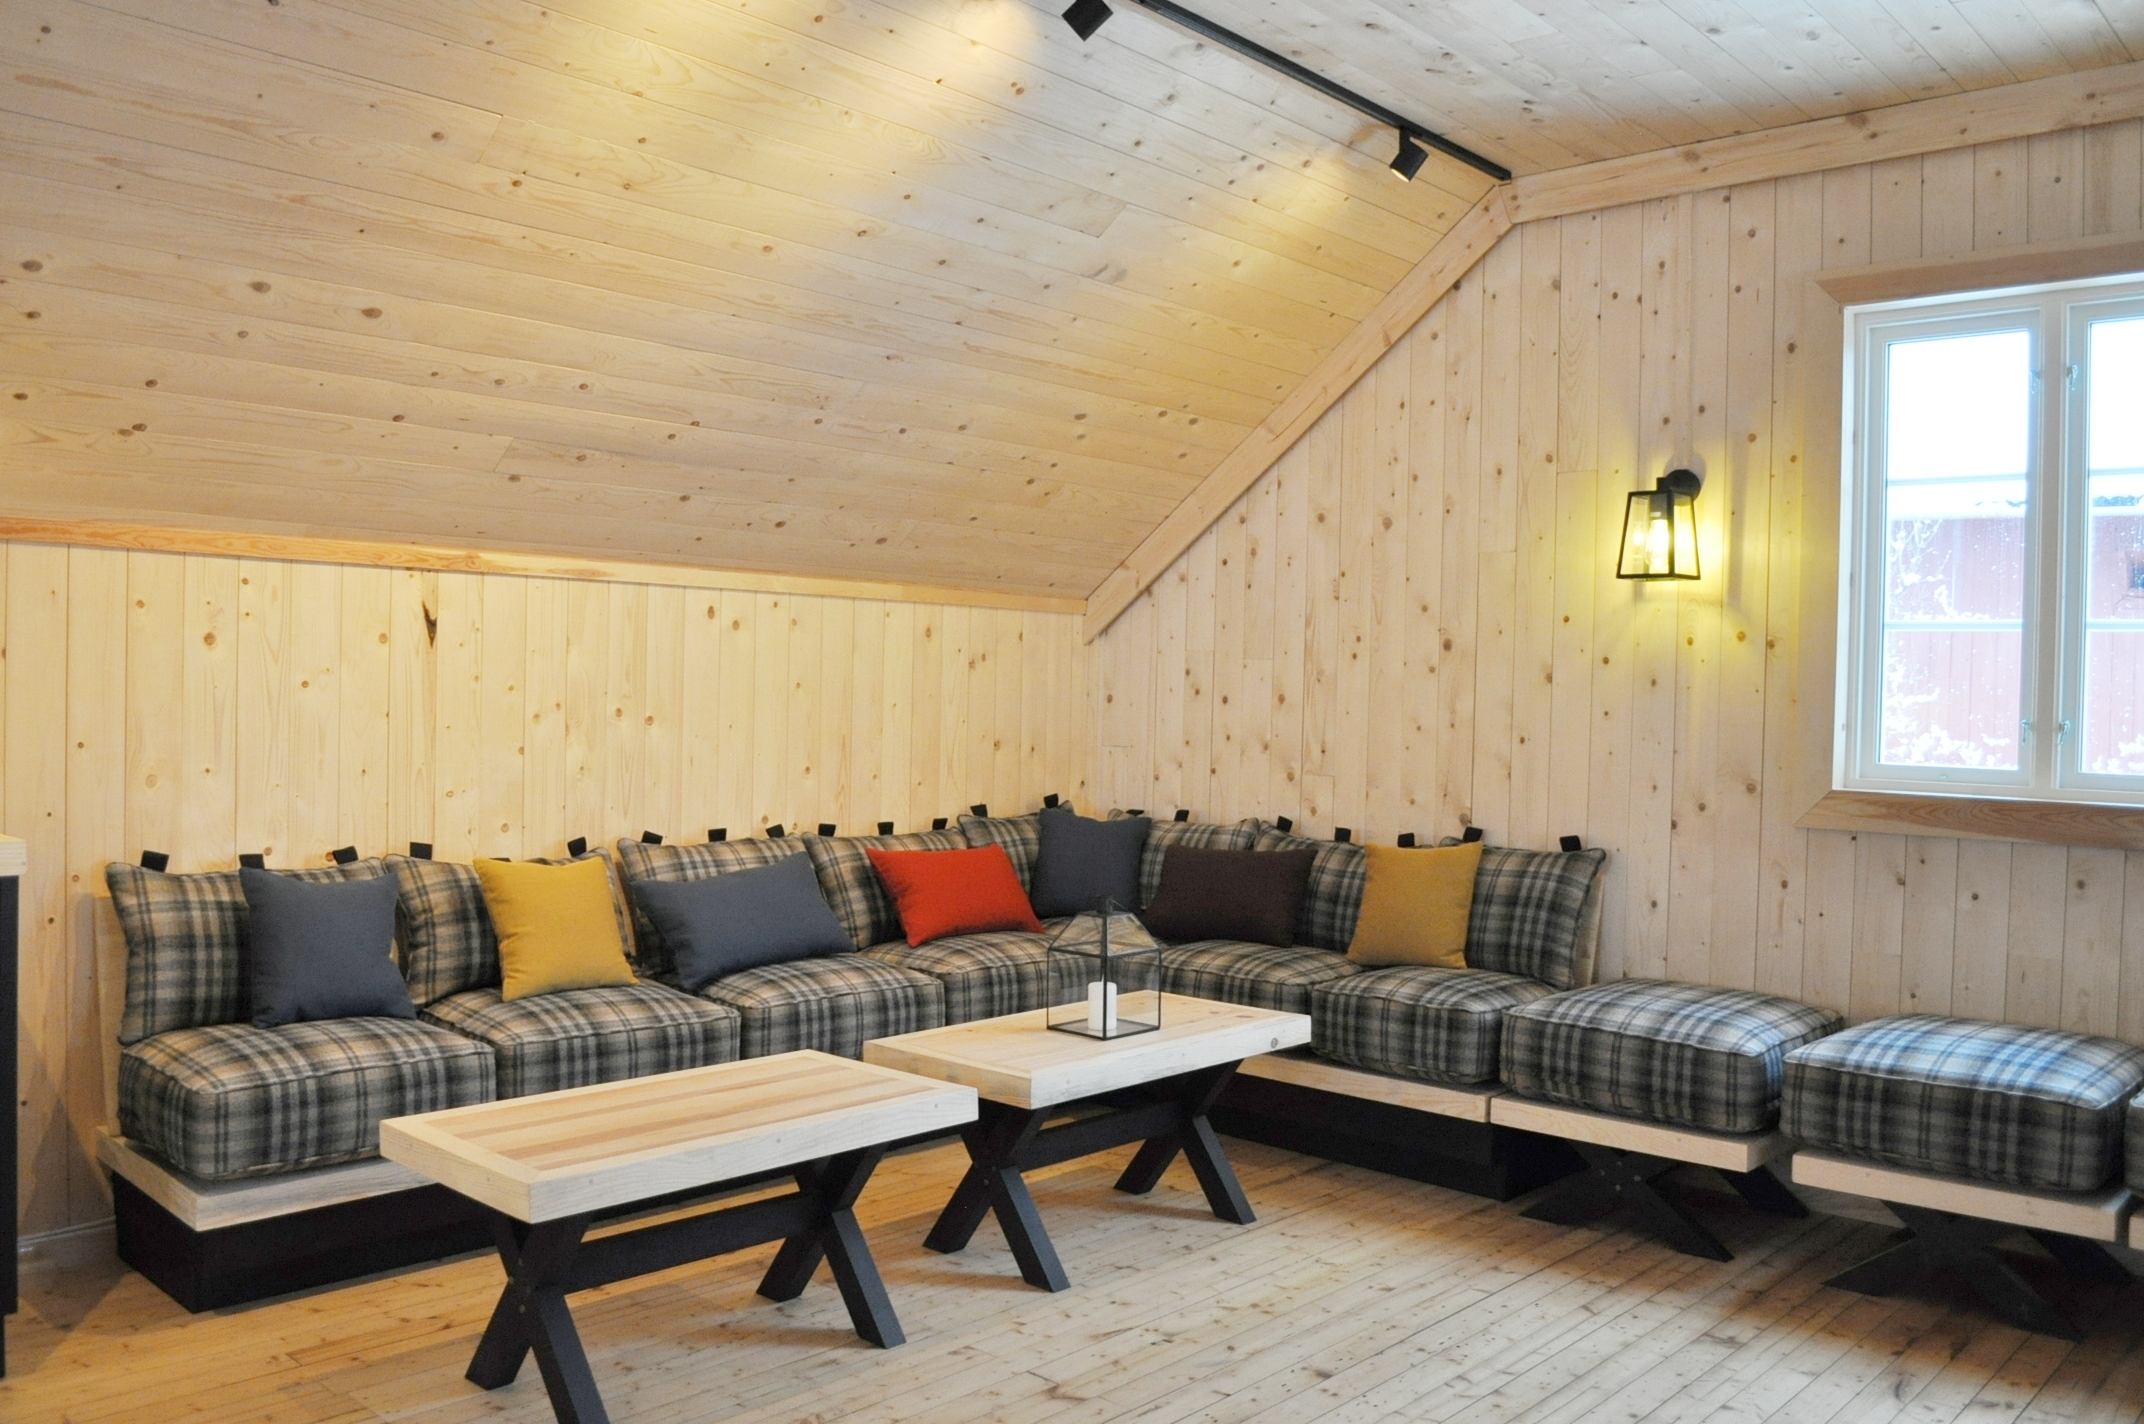 Allrom sofaplass bord interiørarkitektur oslo.jpg